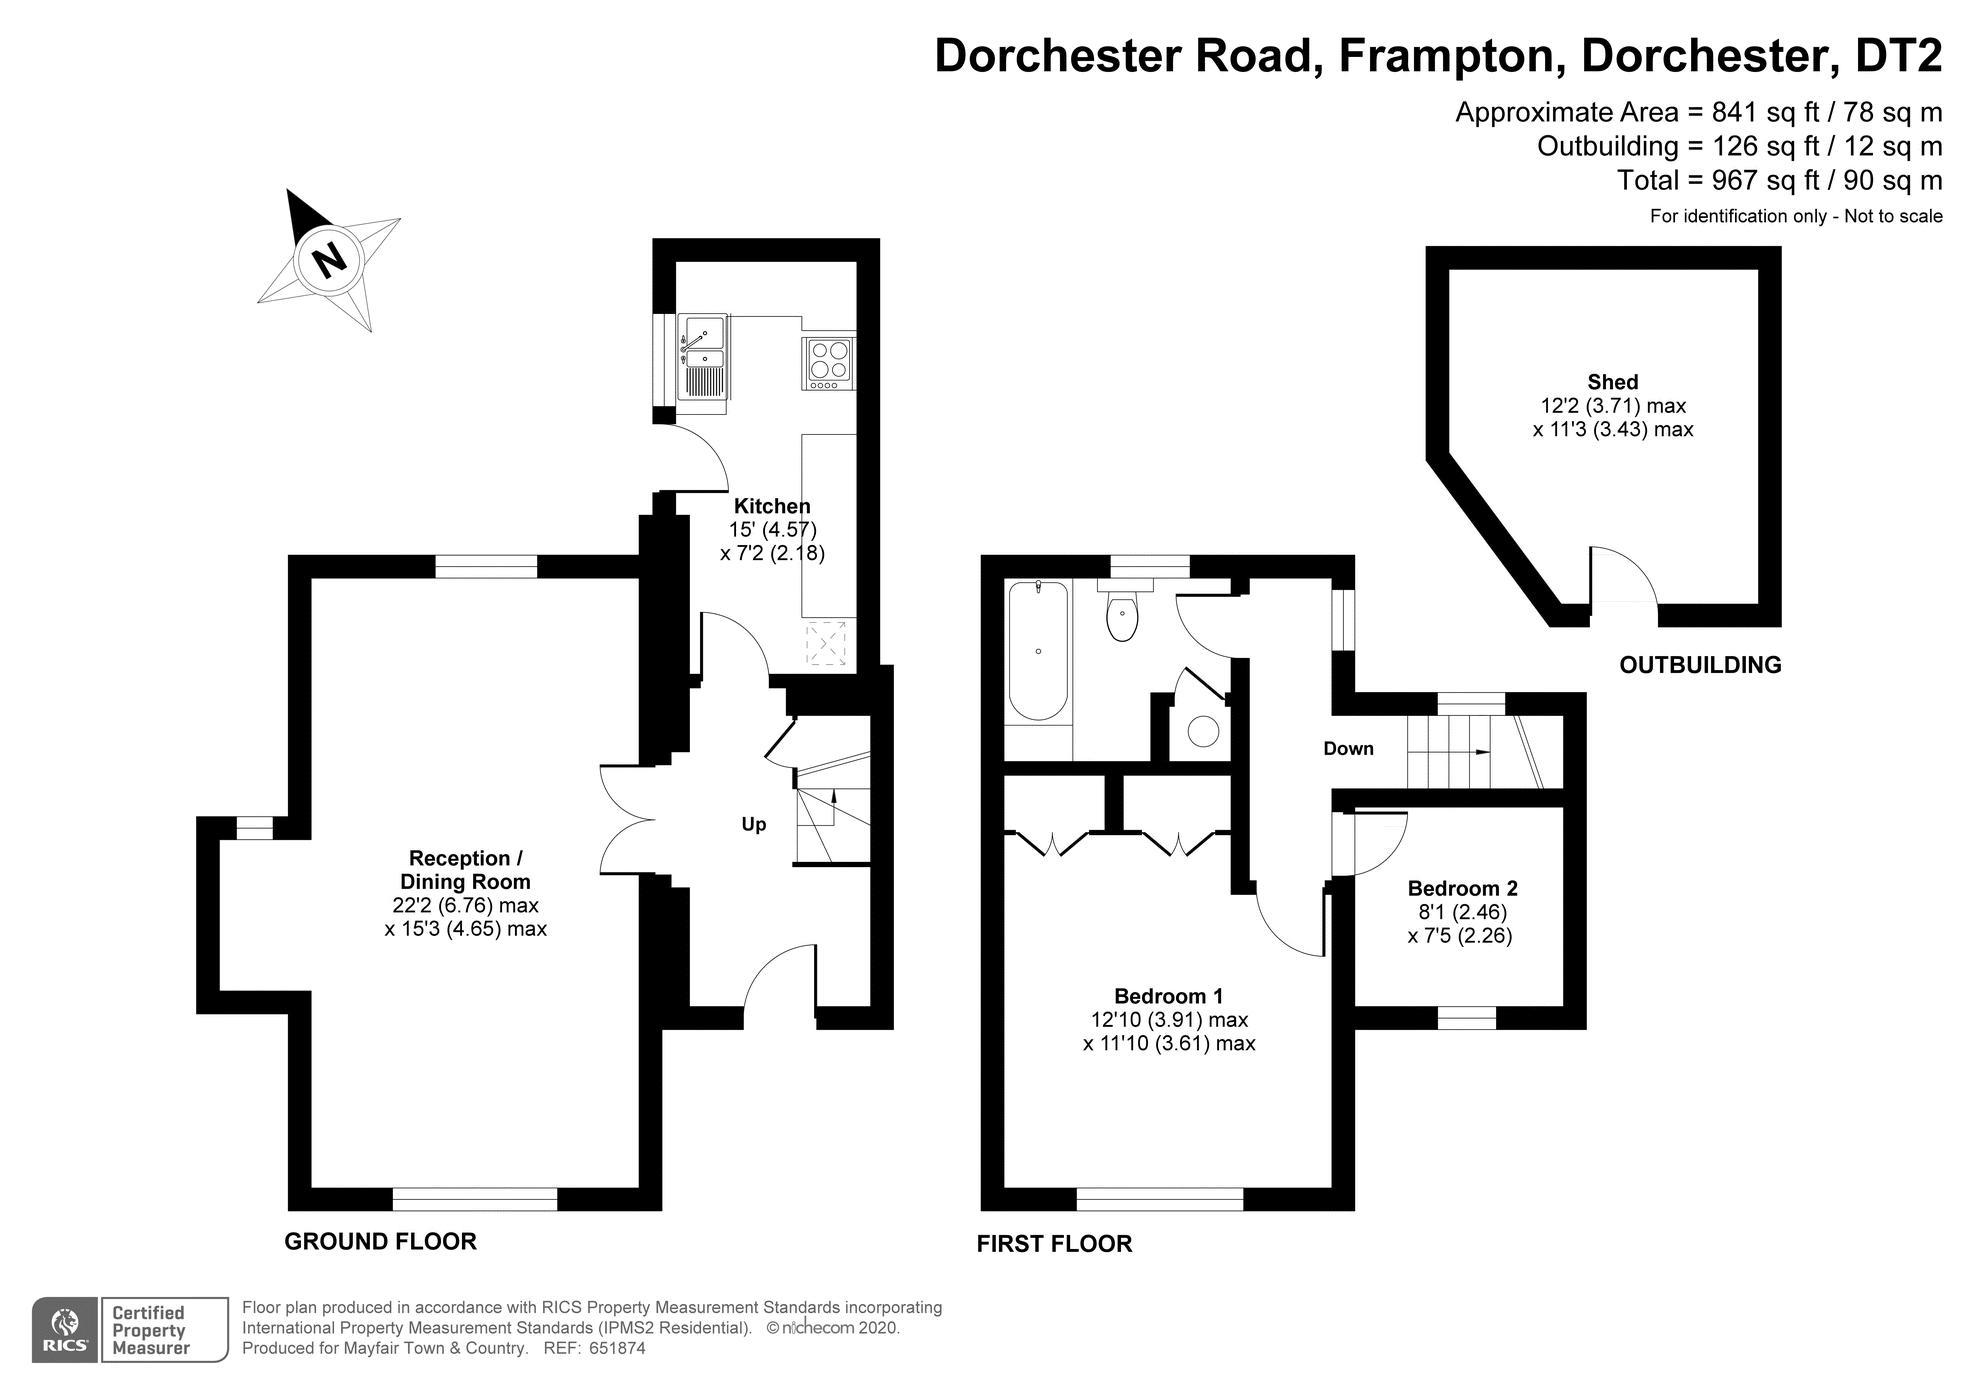 15a Dorchester Road Frampton